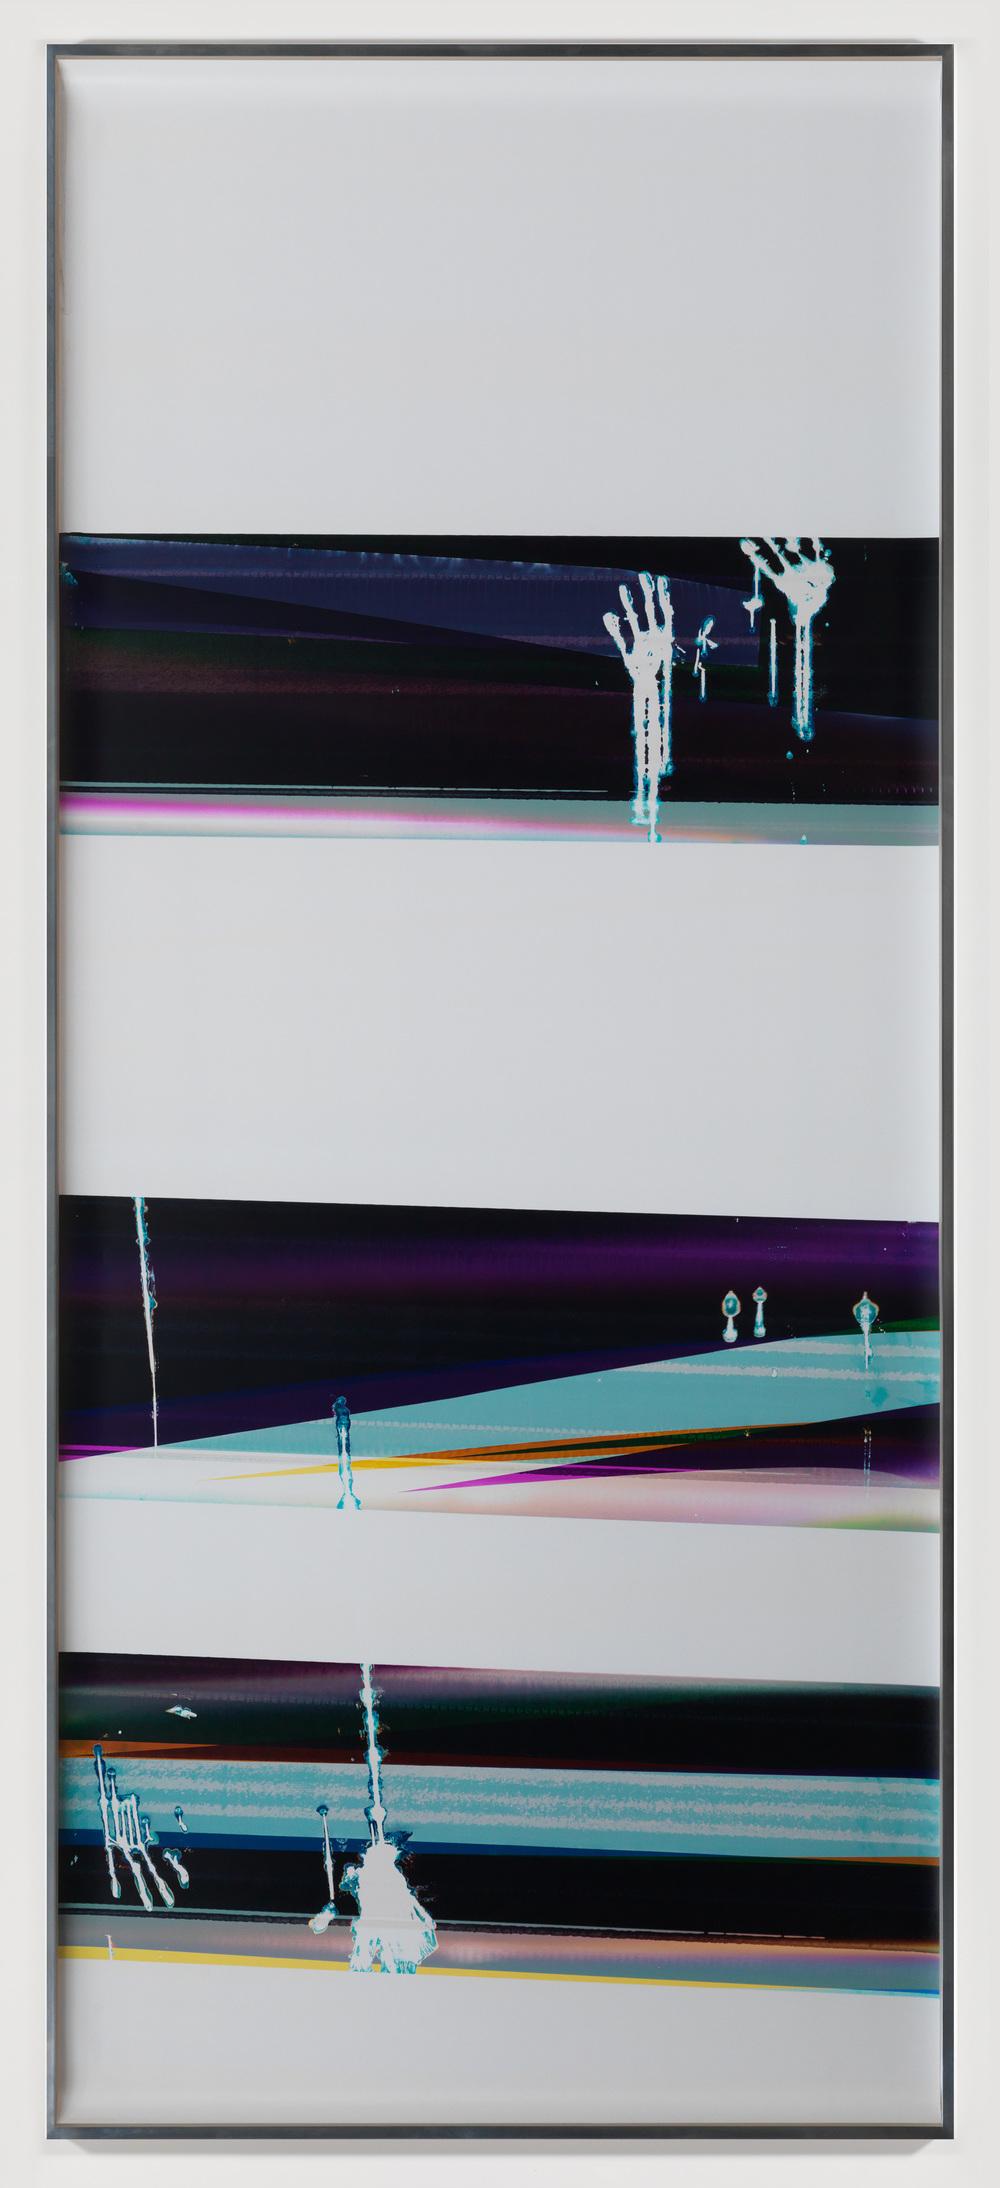 Cross-Contaminated RA4 Contact Print / Processor Stall [Black Curl (9:6/MCY/Six Magnet: Los Angeles, California, April 14, 2014, Fujicolor Crystal Archive Super Type C, Em. No. 107-016, Kodak Ektacolor RA Bleach-Fix and Replenisher, Cat. No. 847 1484, 61214), Kreonite KM IV 5225 RA4 Color Processor, Ser. No. 00092174]    2014   Color photographic paper  124 1/2 x 50 inches   Gastarbeiten, 2014